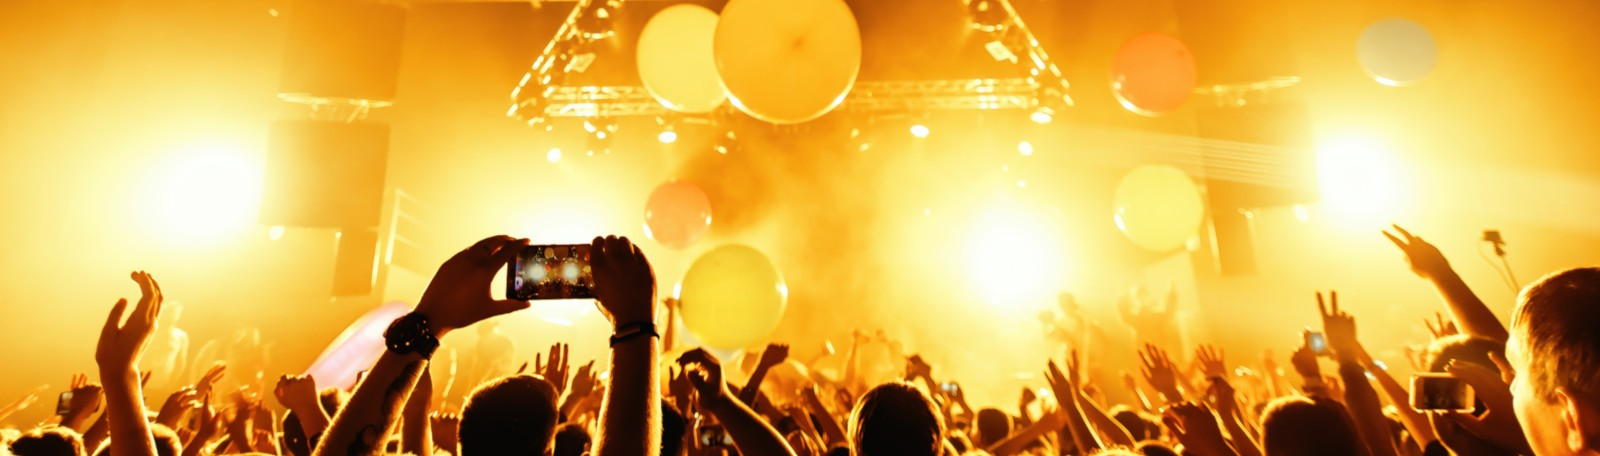 Concerts paris daumesnils accorhotel arena